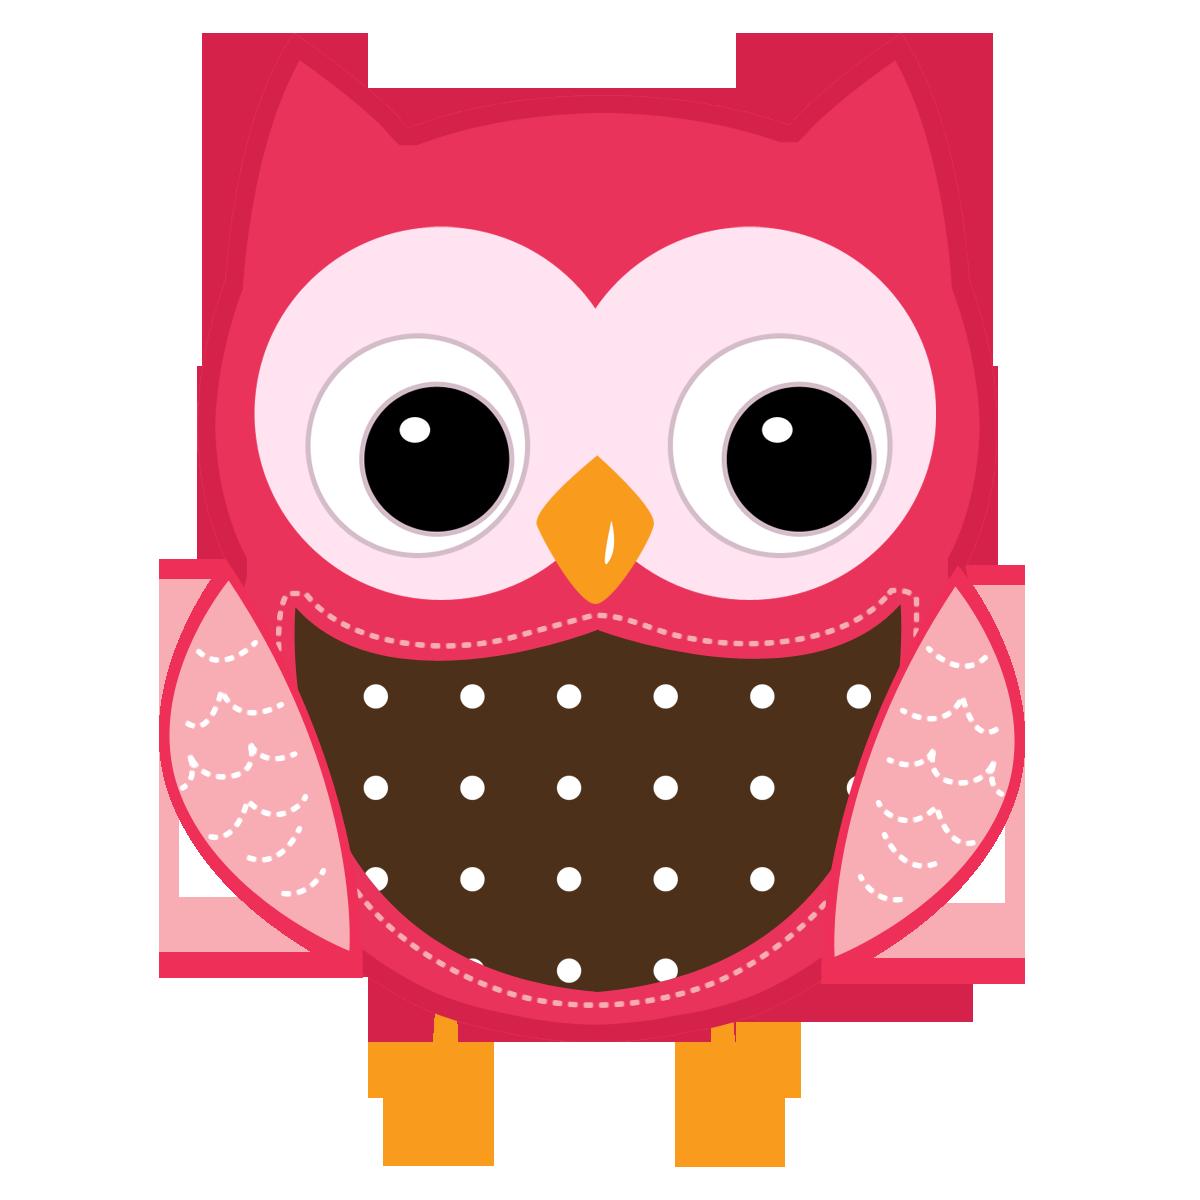 Free Owl Wallpapers: Cute Cartoon Owl Wallpaper